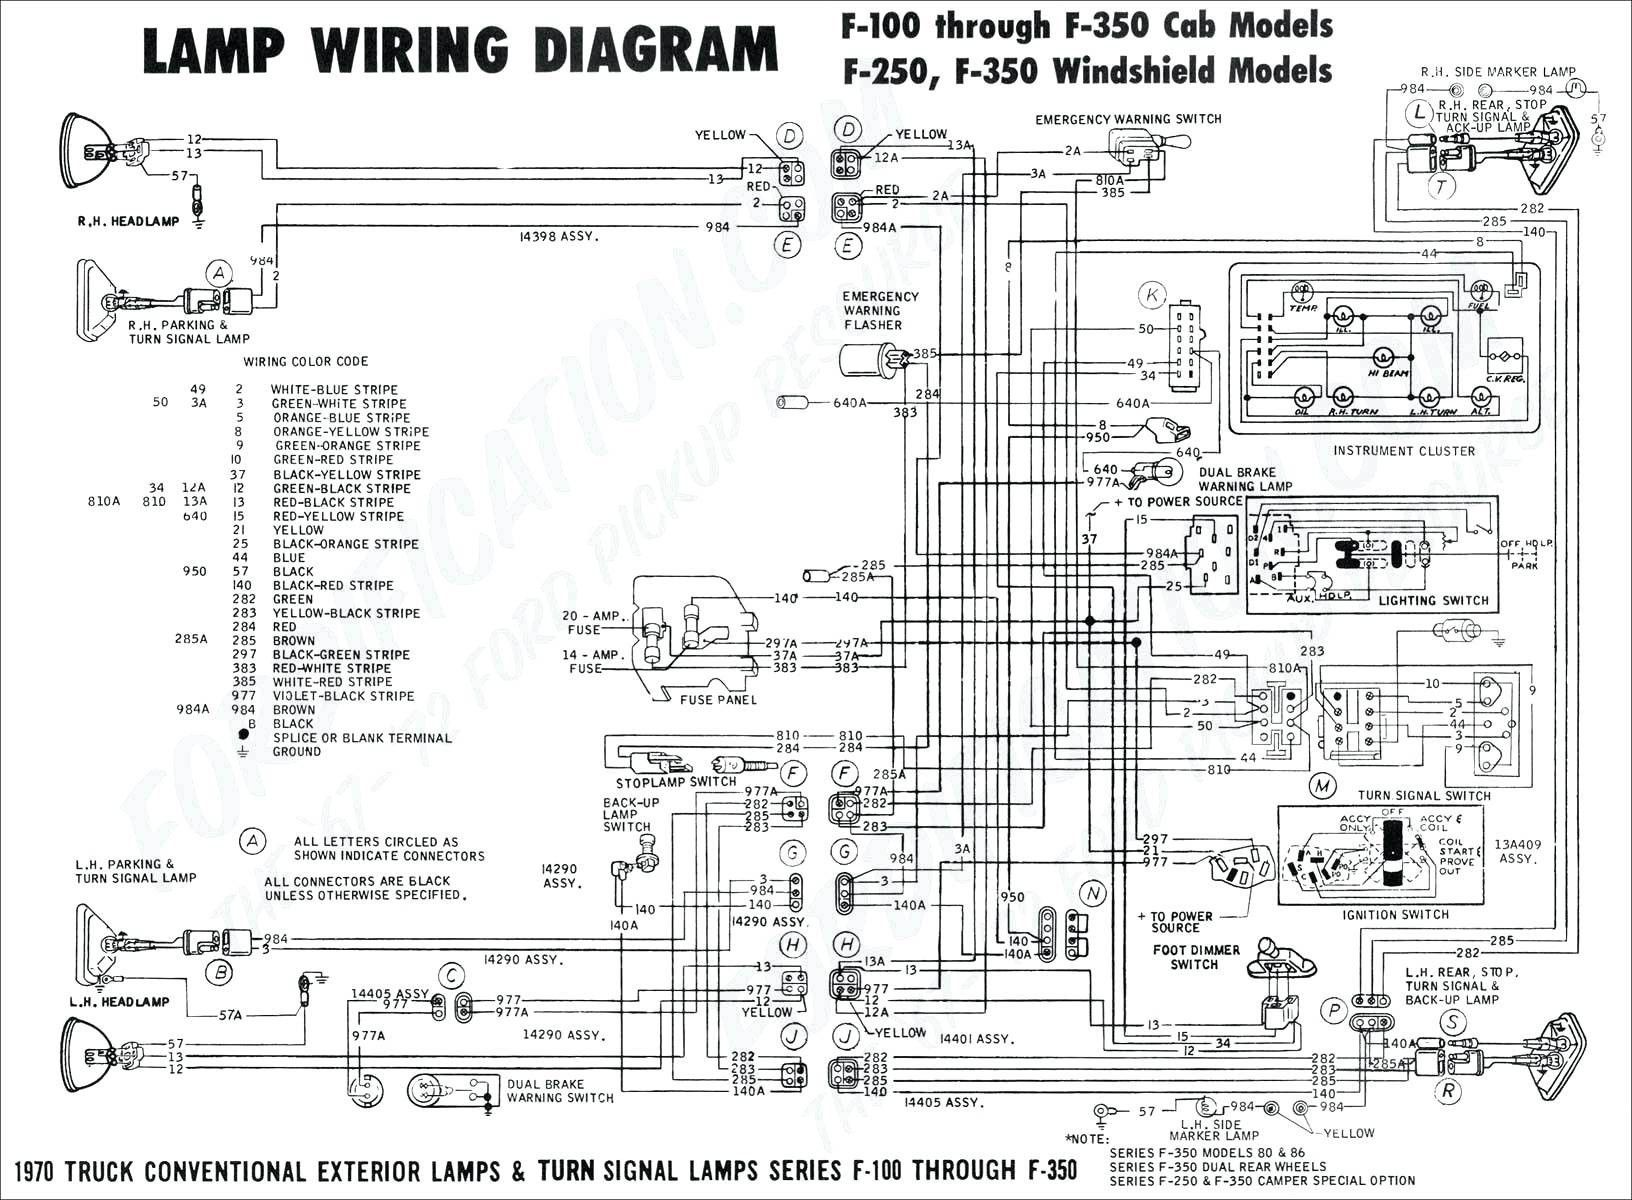 Awesome Western Snow Plow Wiring Diagram Unimount Di 2020 Audi A4 Diagram Audi